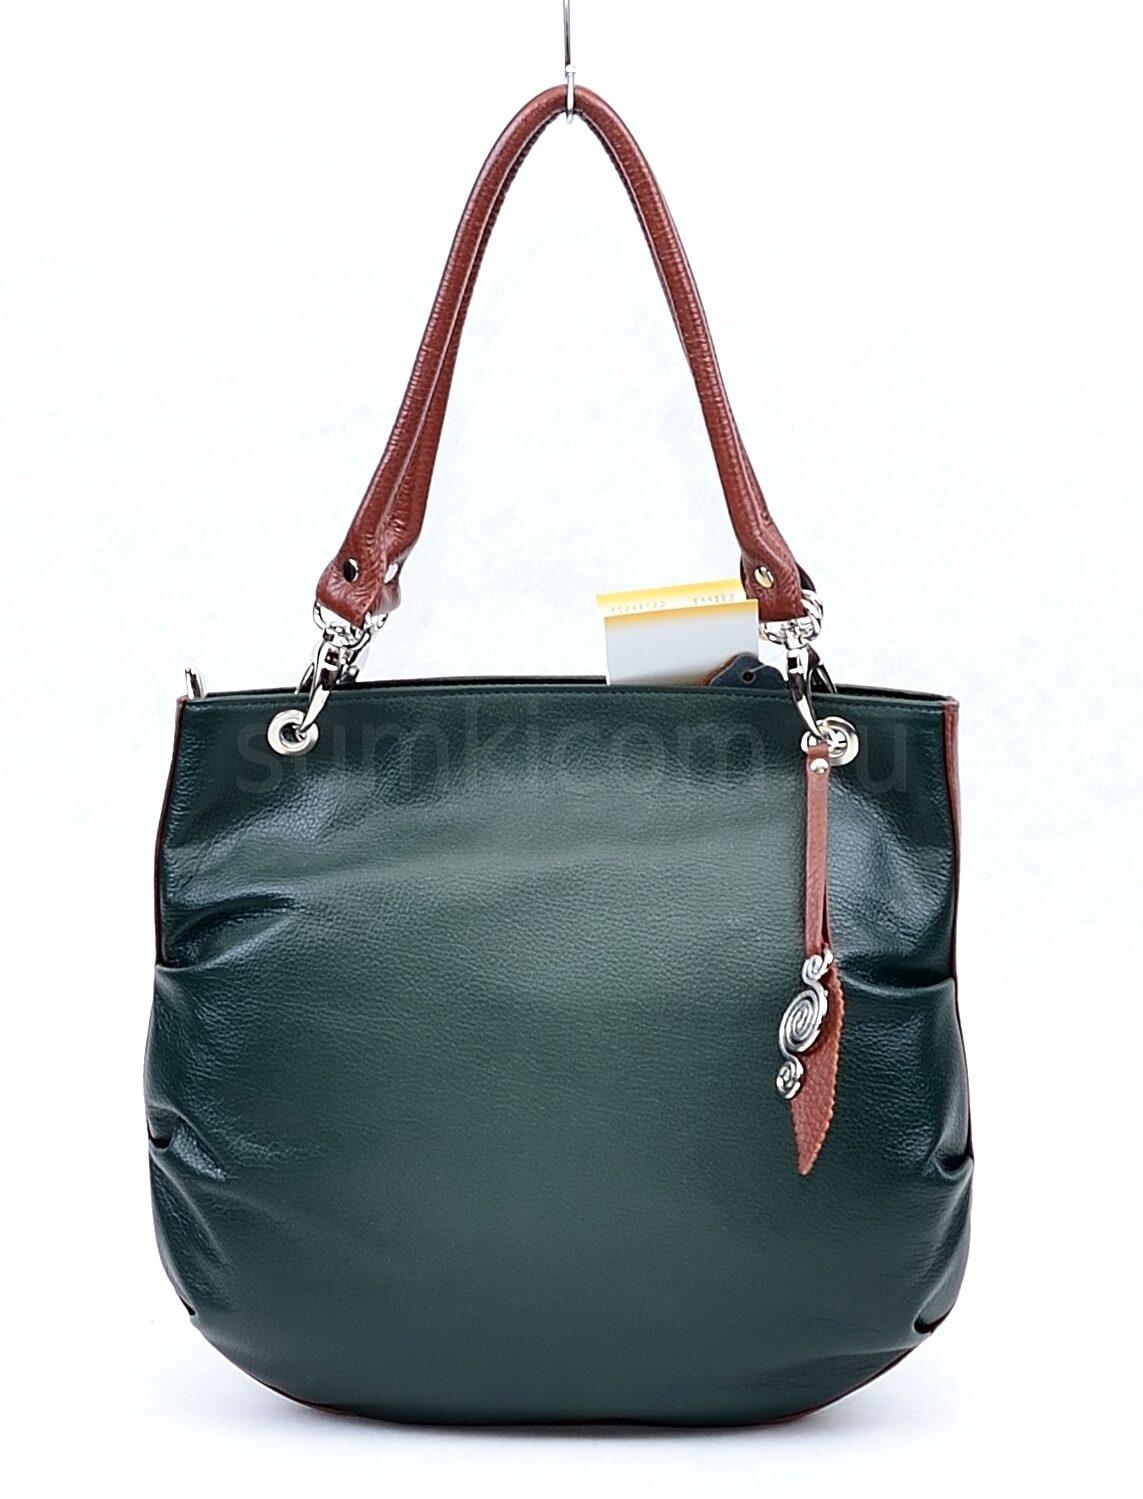 97096e5f09ff Зеленая сумка с коричневыми ручками Сумки фабрики Александр архив ...